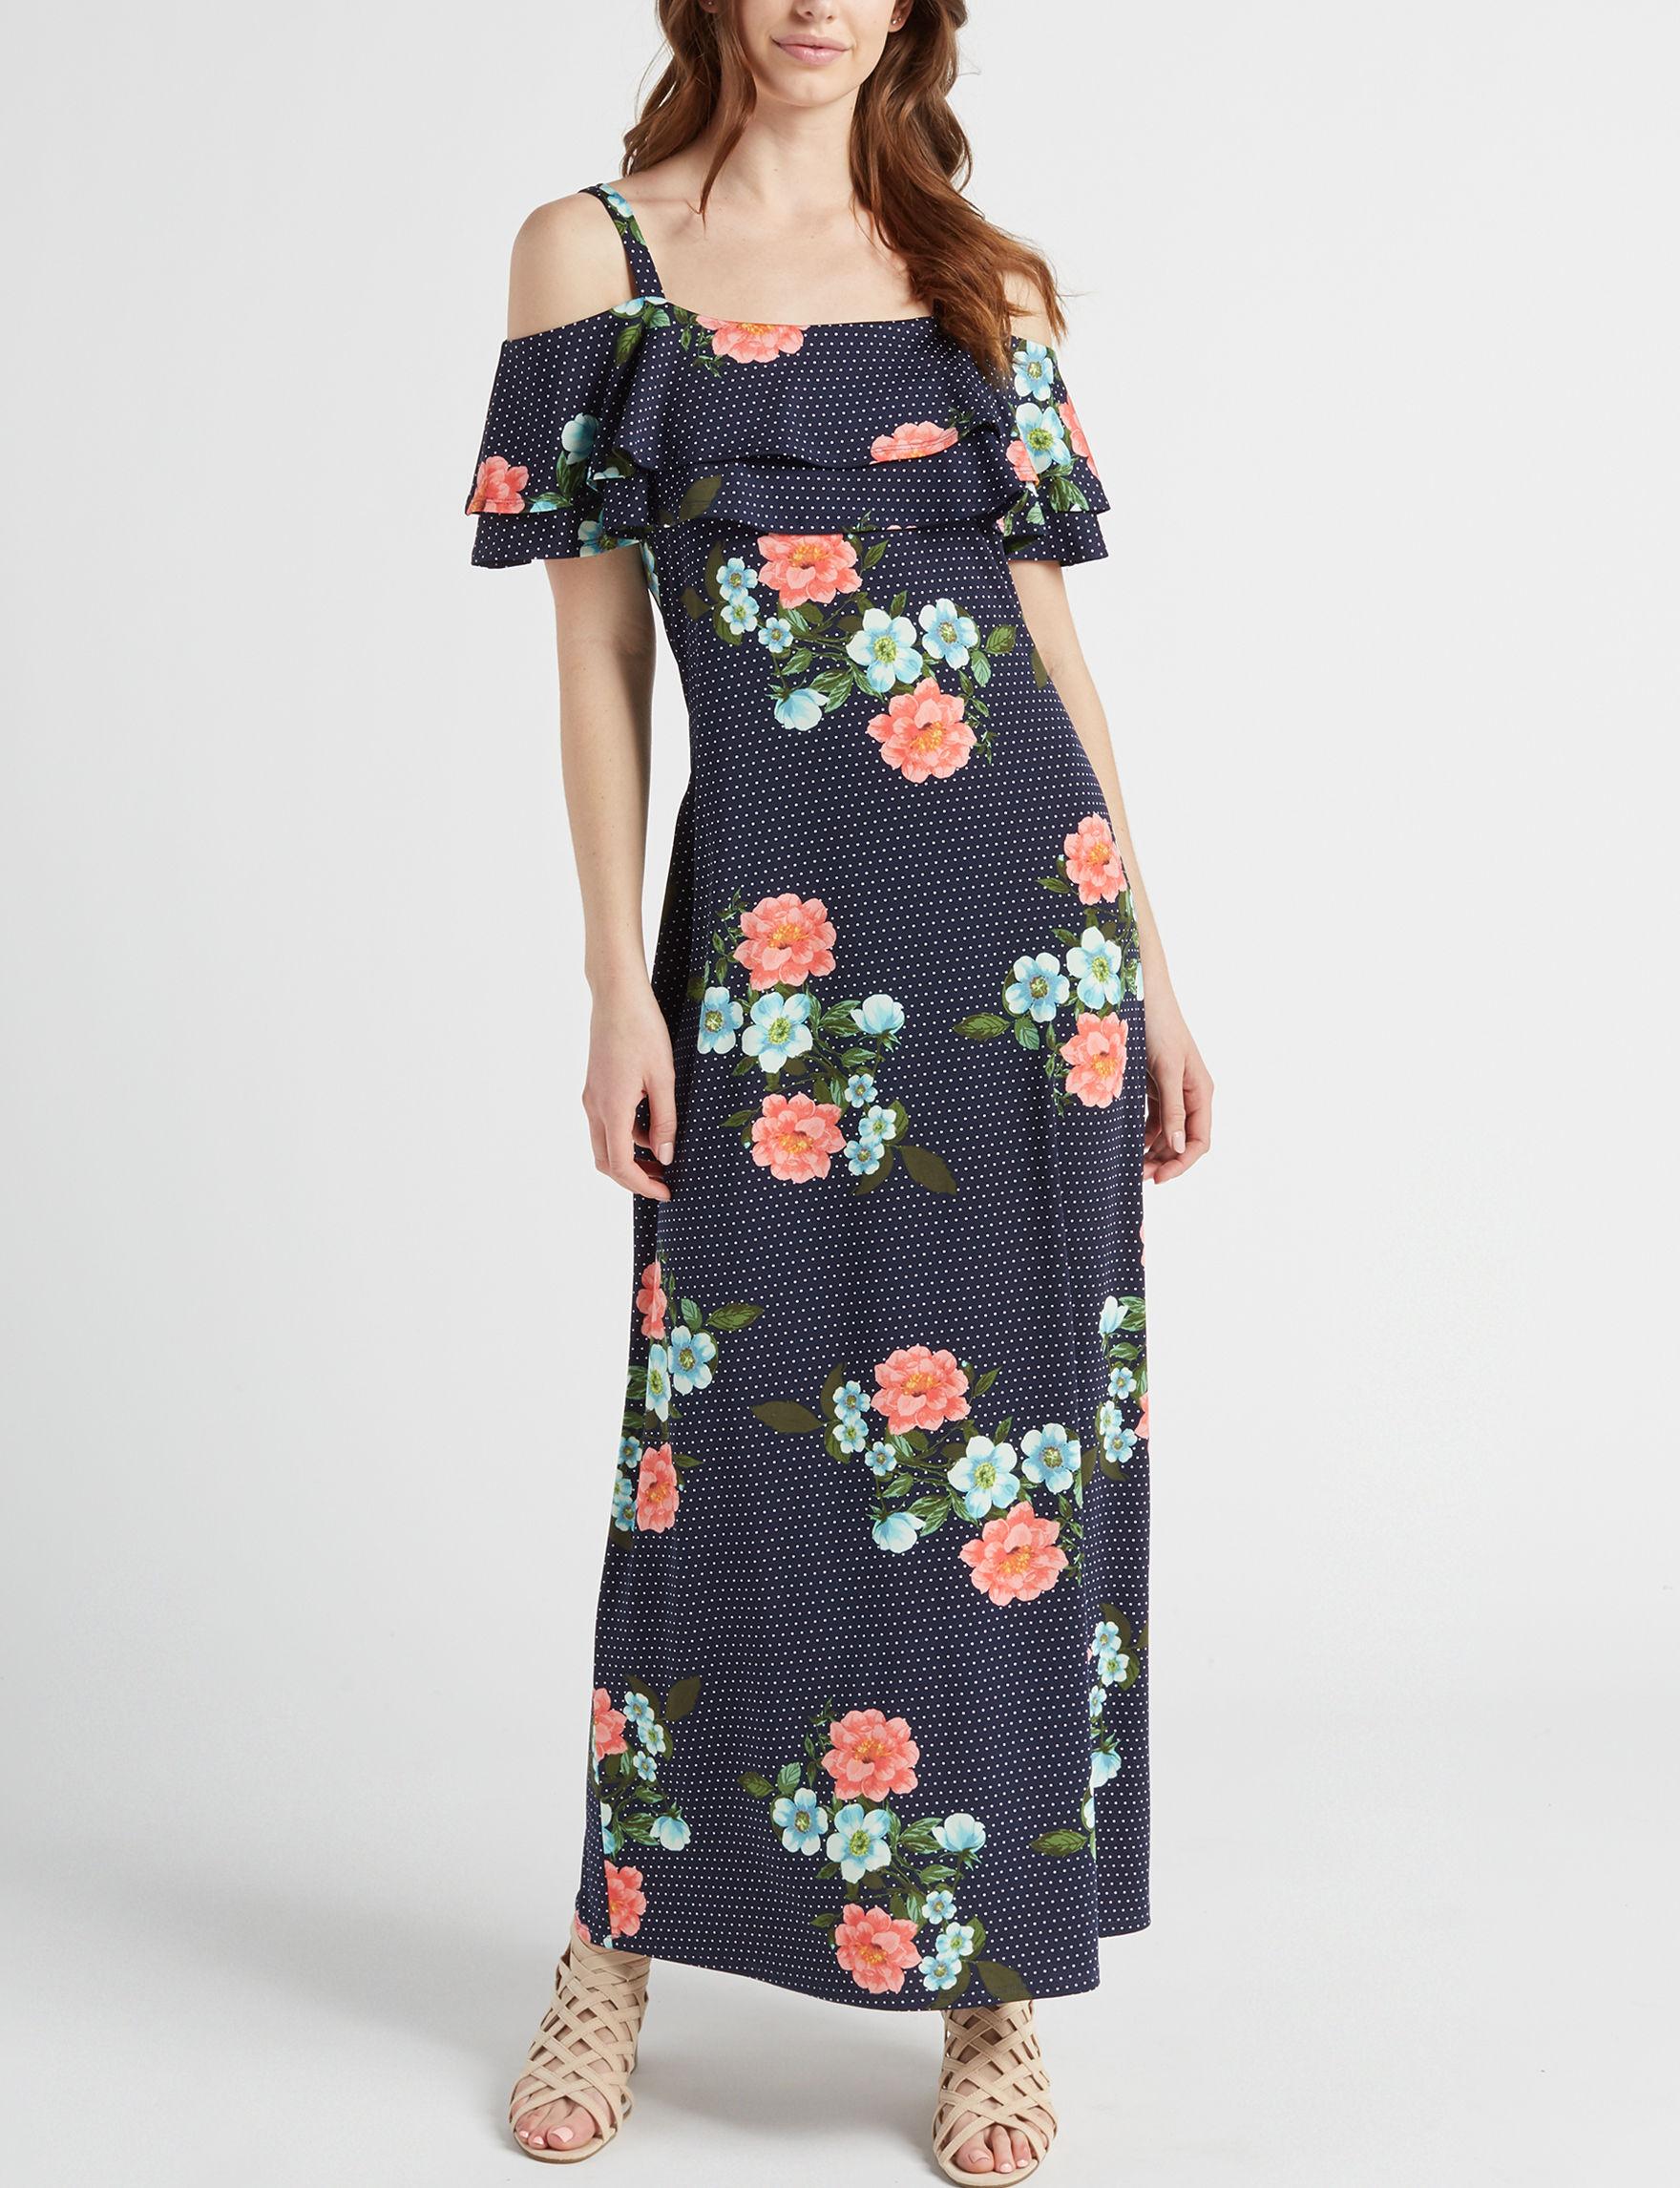 Nina Leonard Black Floral Everyday & Casual